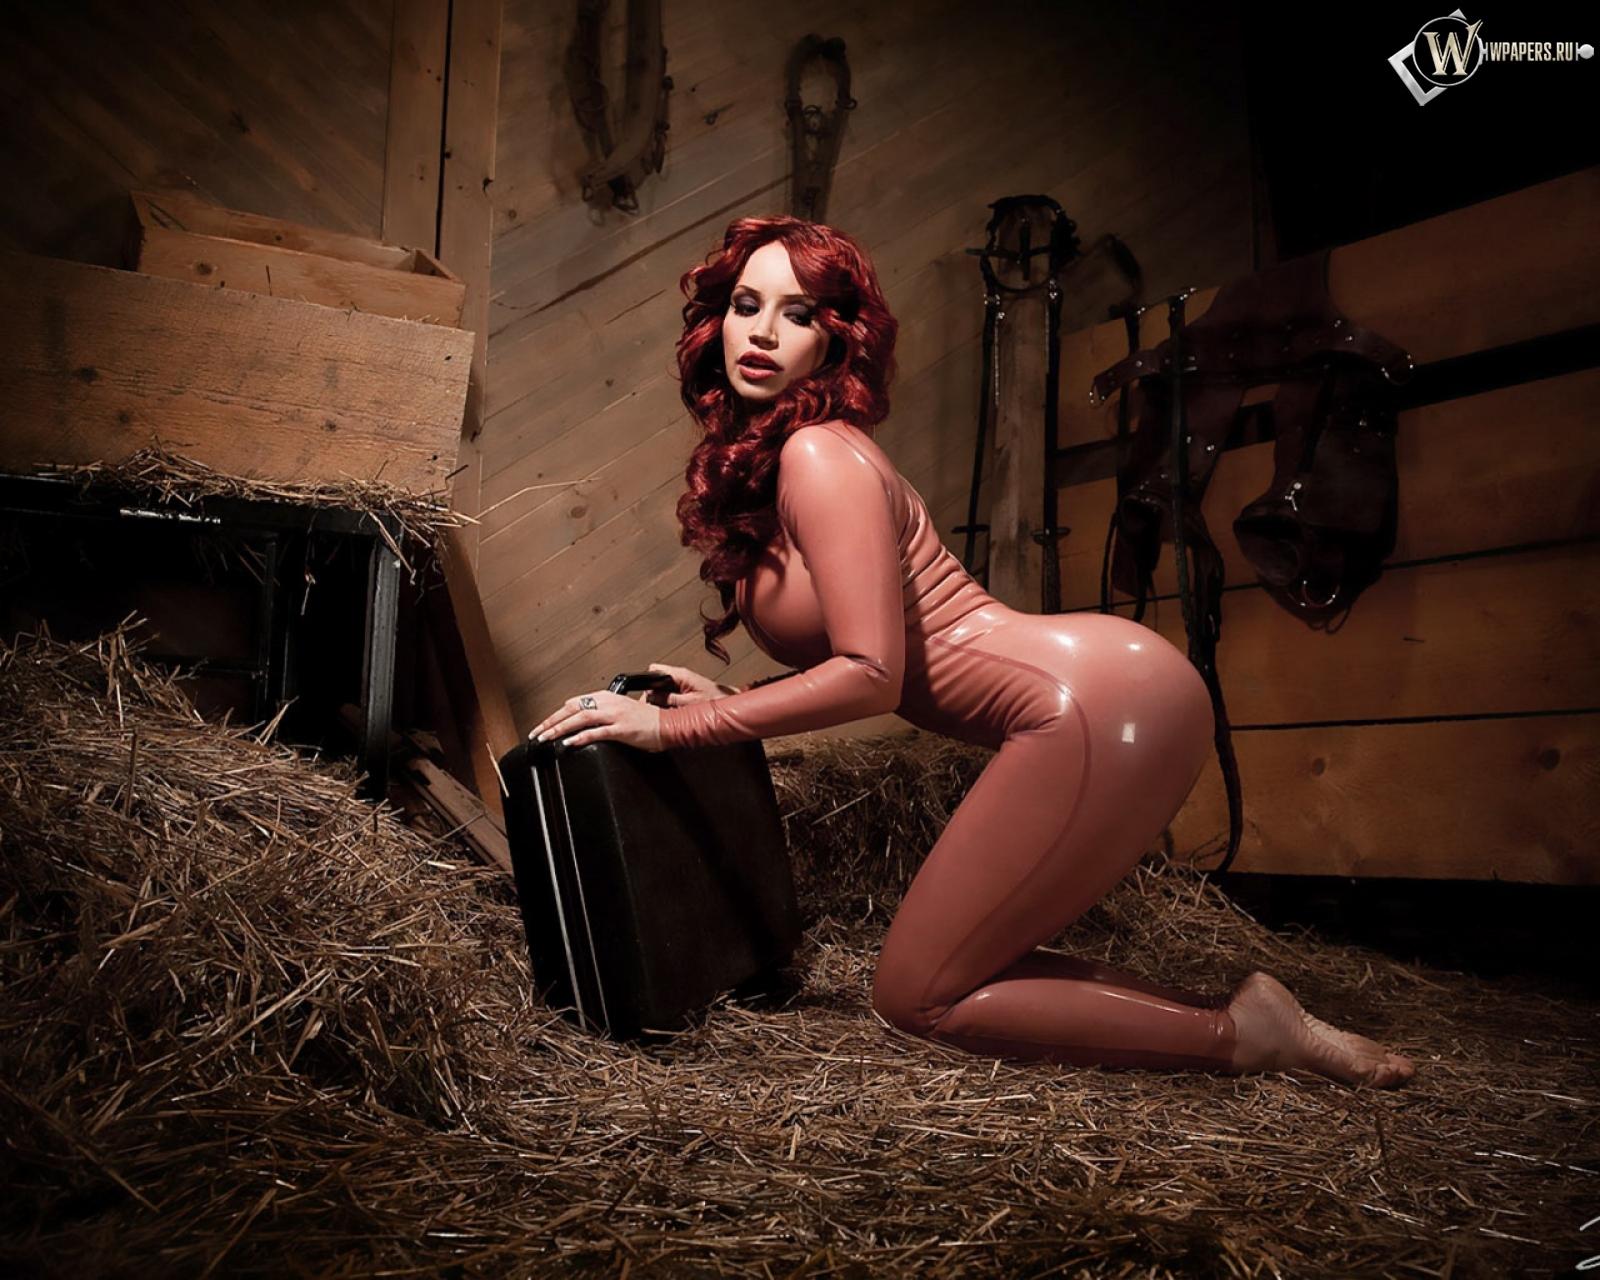 Секси женщина в конюшне фото 3 фотография